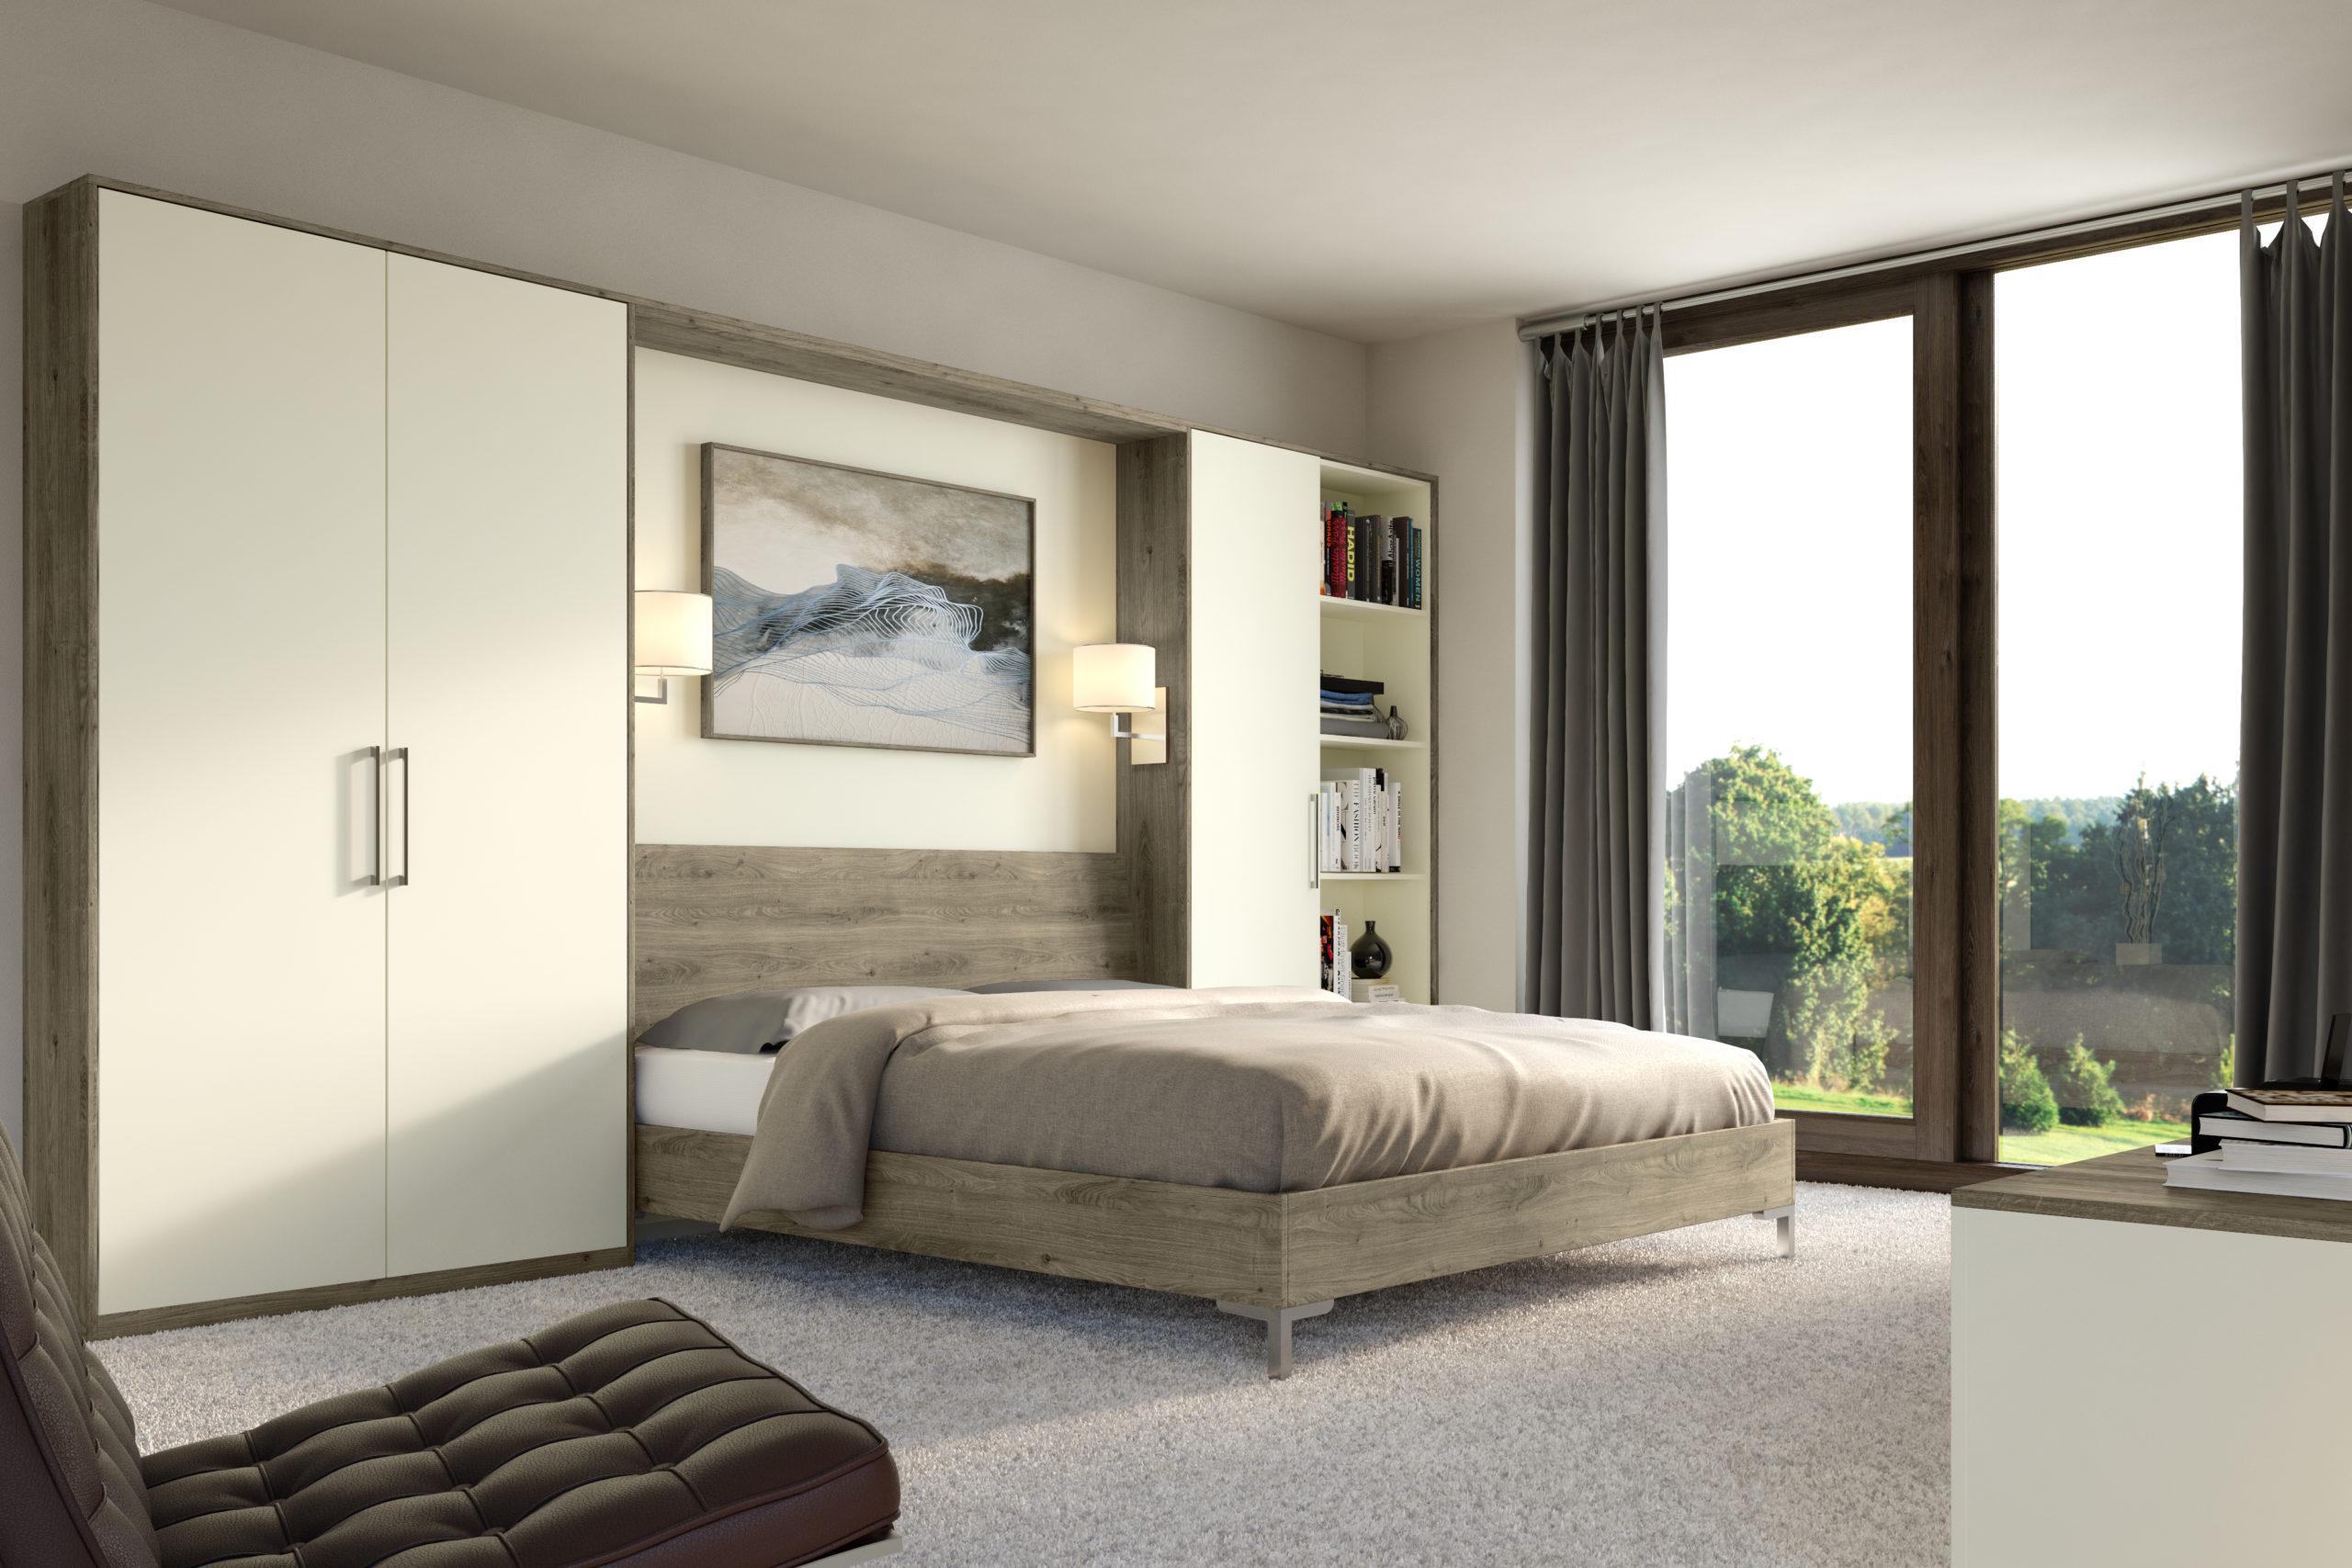 Cream and Denver oak fitted bedroom furniture